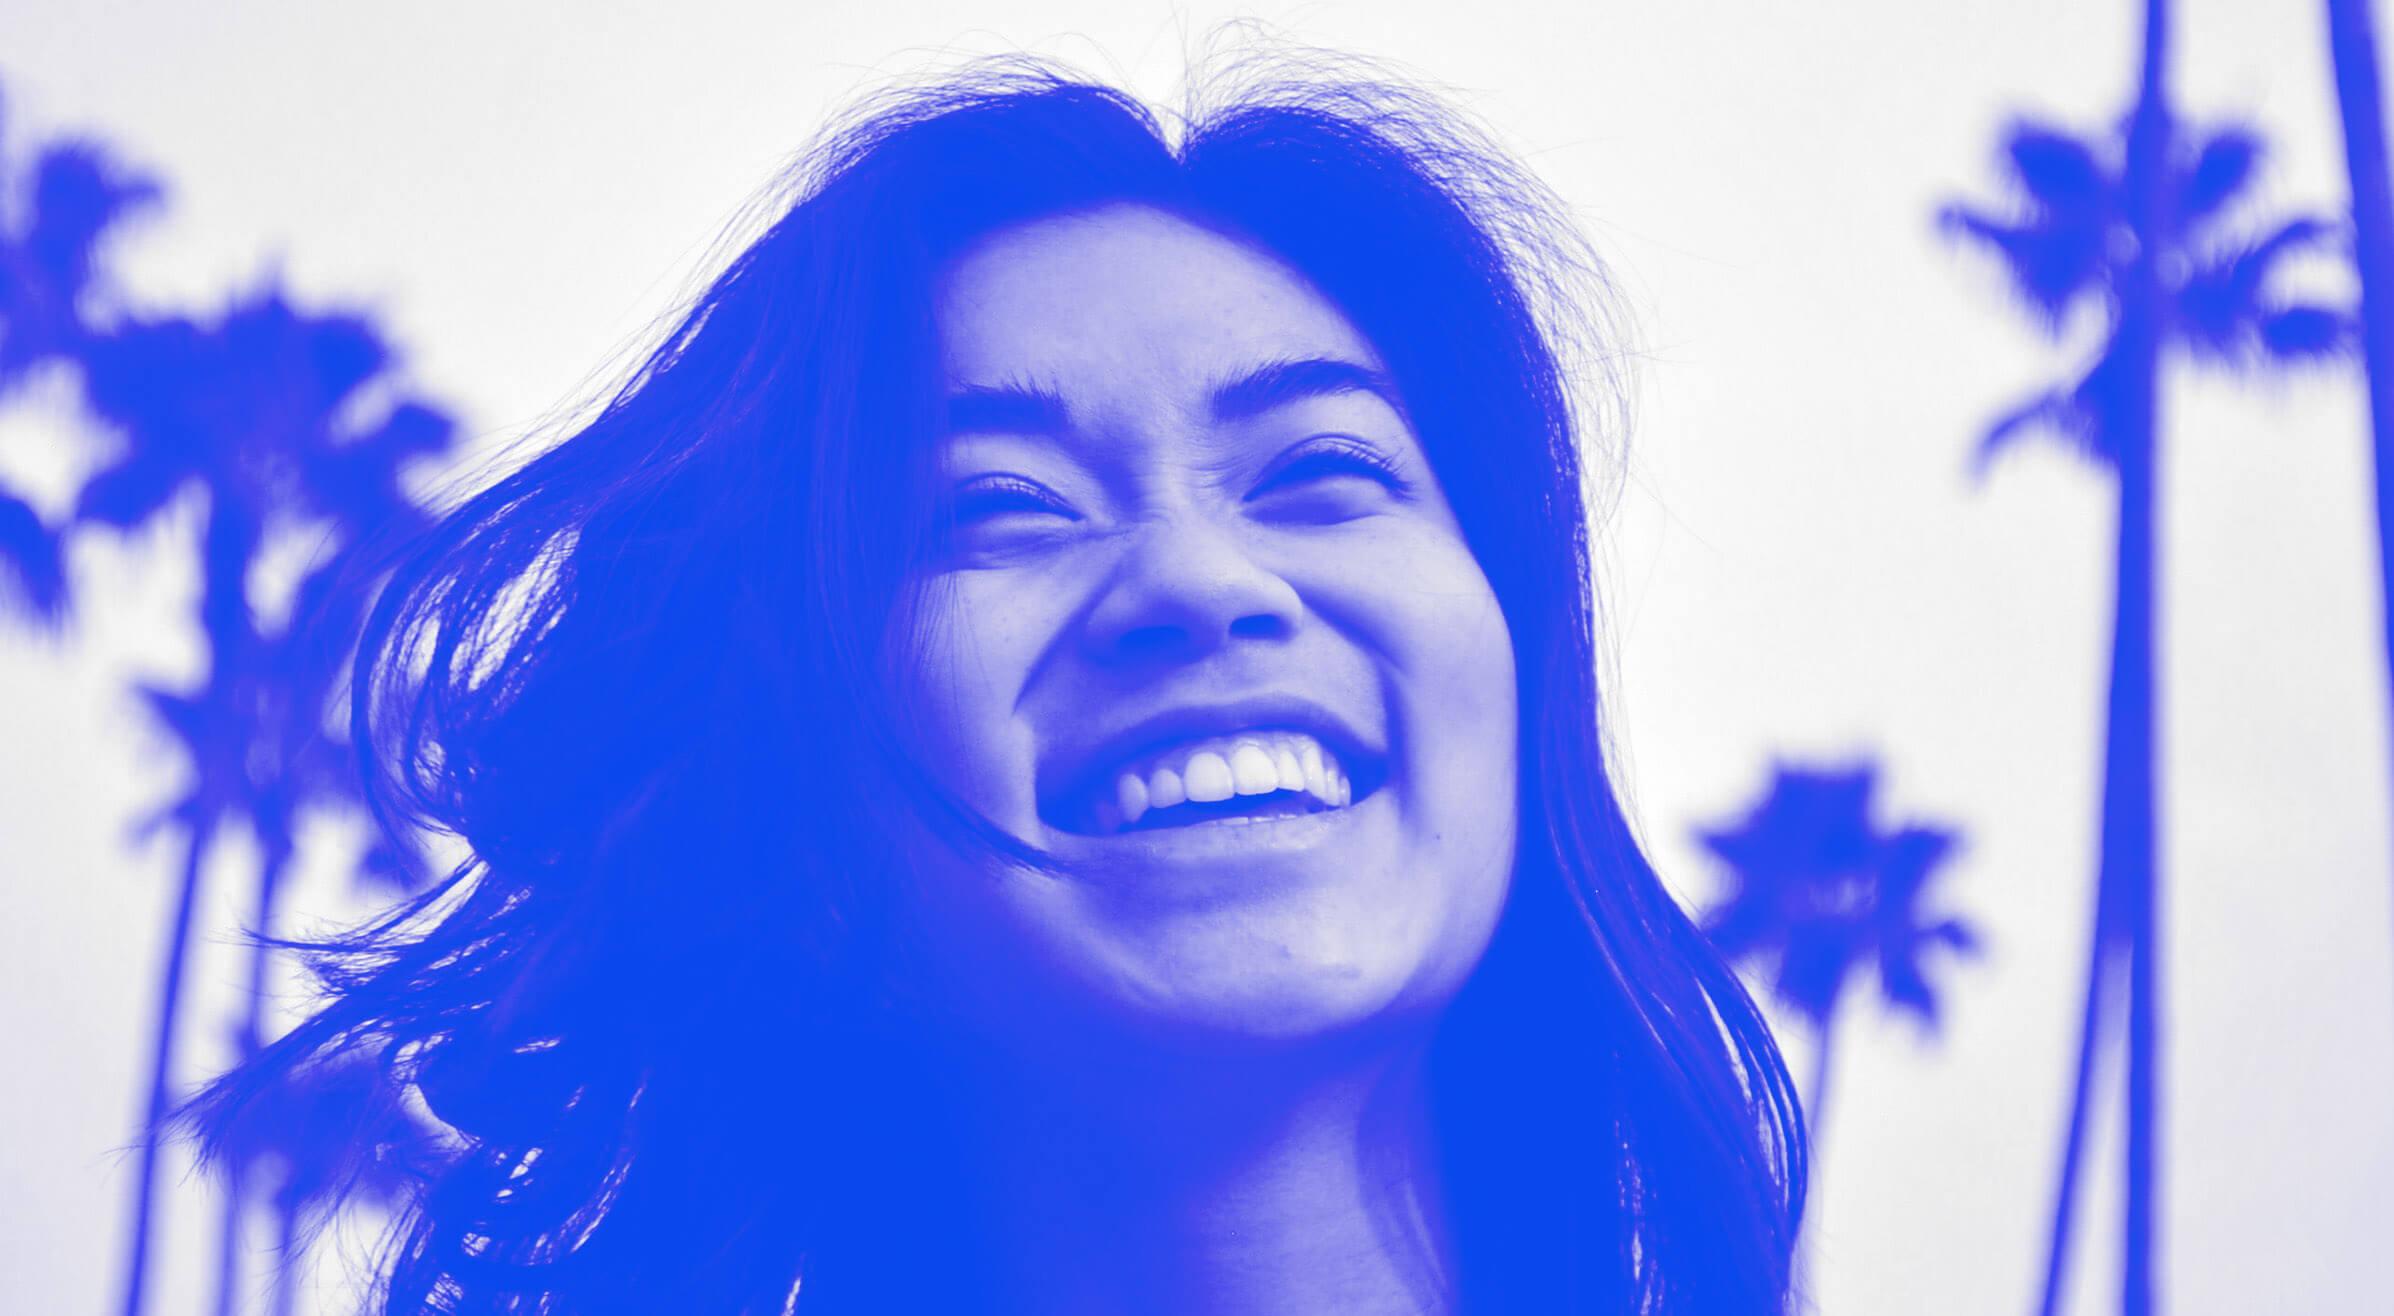 Smiling girl Videa